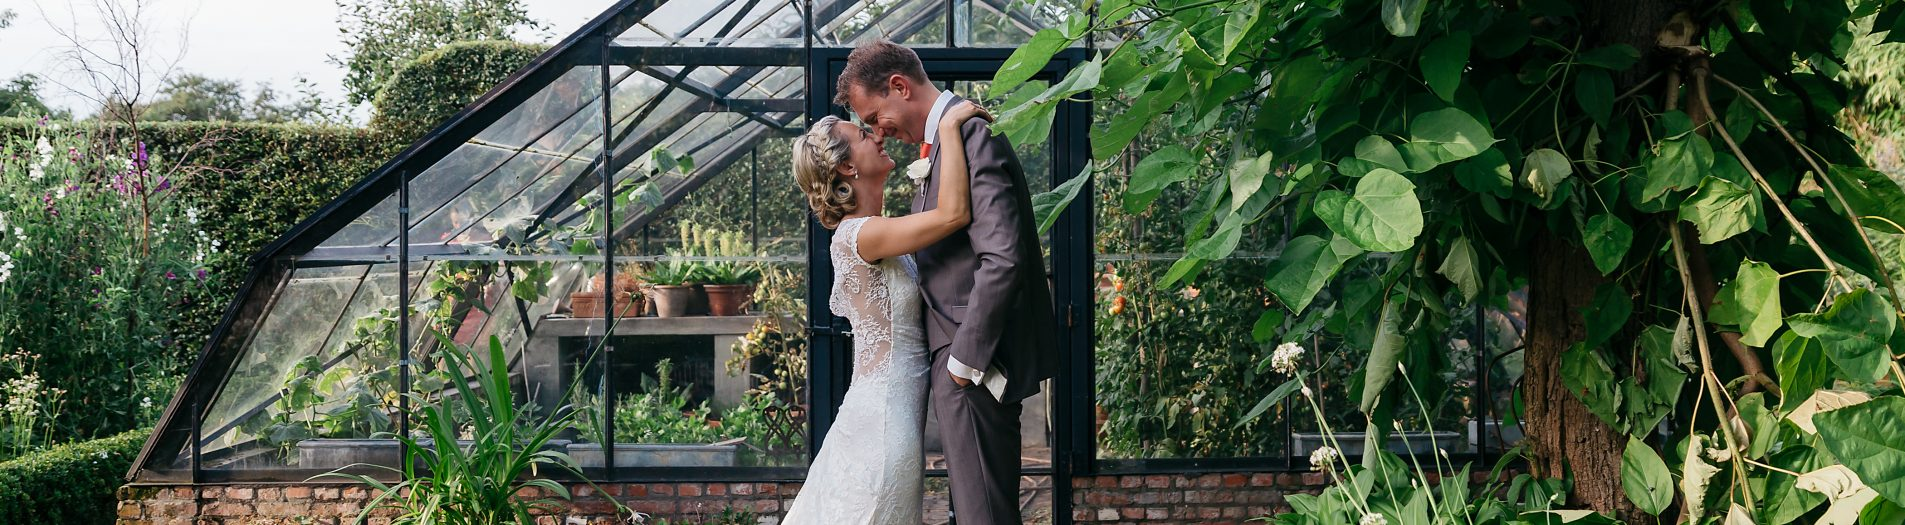 Bruidsfotografie fotoshoot